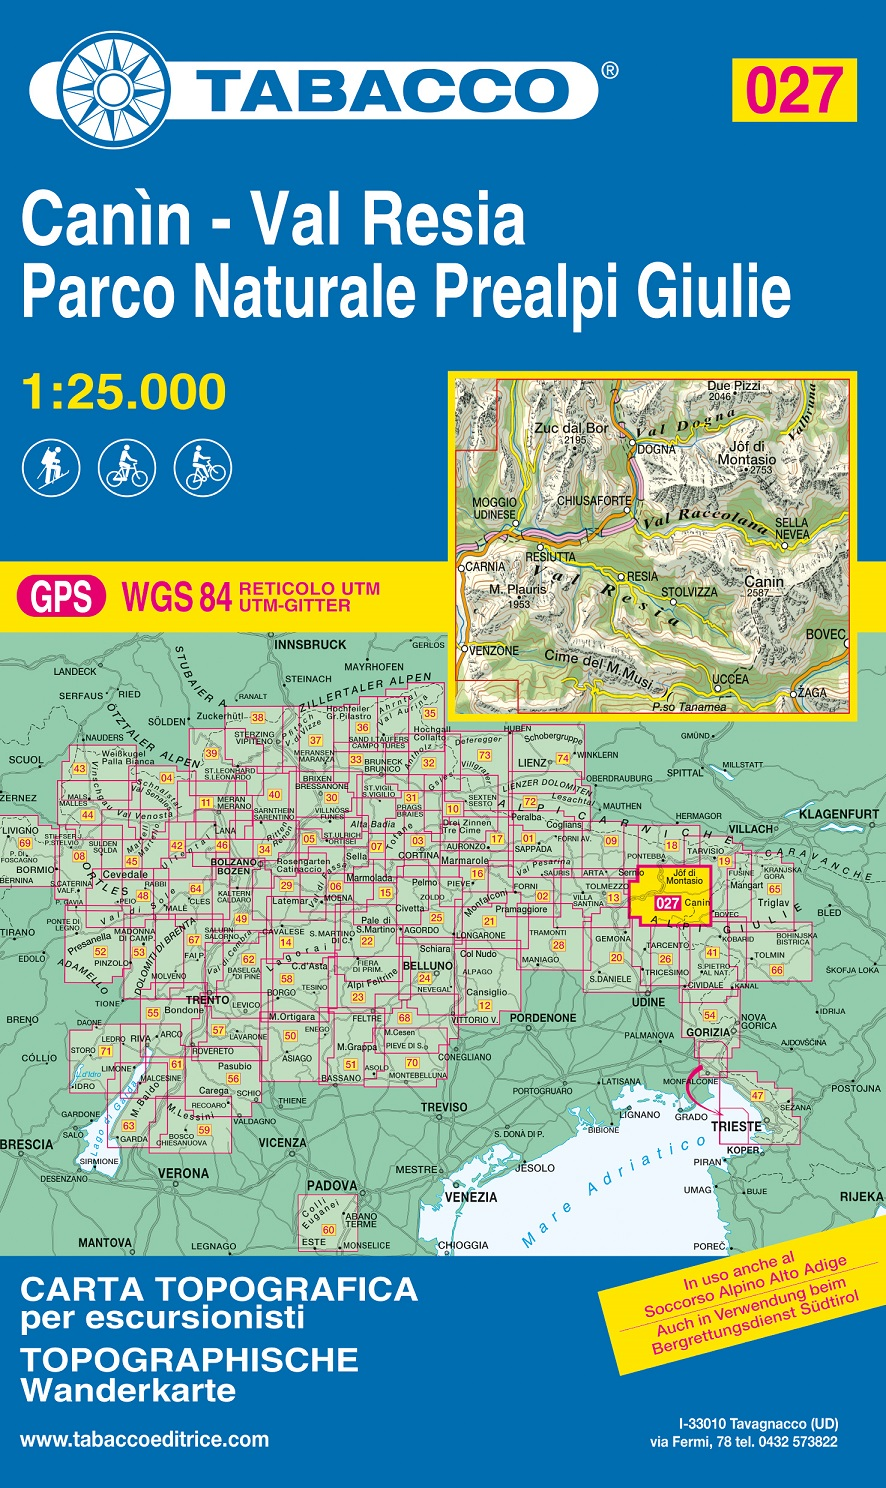 TAB-27  Canin - Valli di Resia e Raccolana | Tabacco wandelkaart 9788883151293  Tabacco Tabacco 1:25.000  Wandelkaarten Venetië, Veneto, Friuli